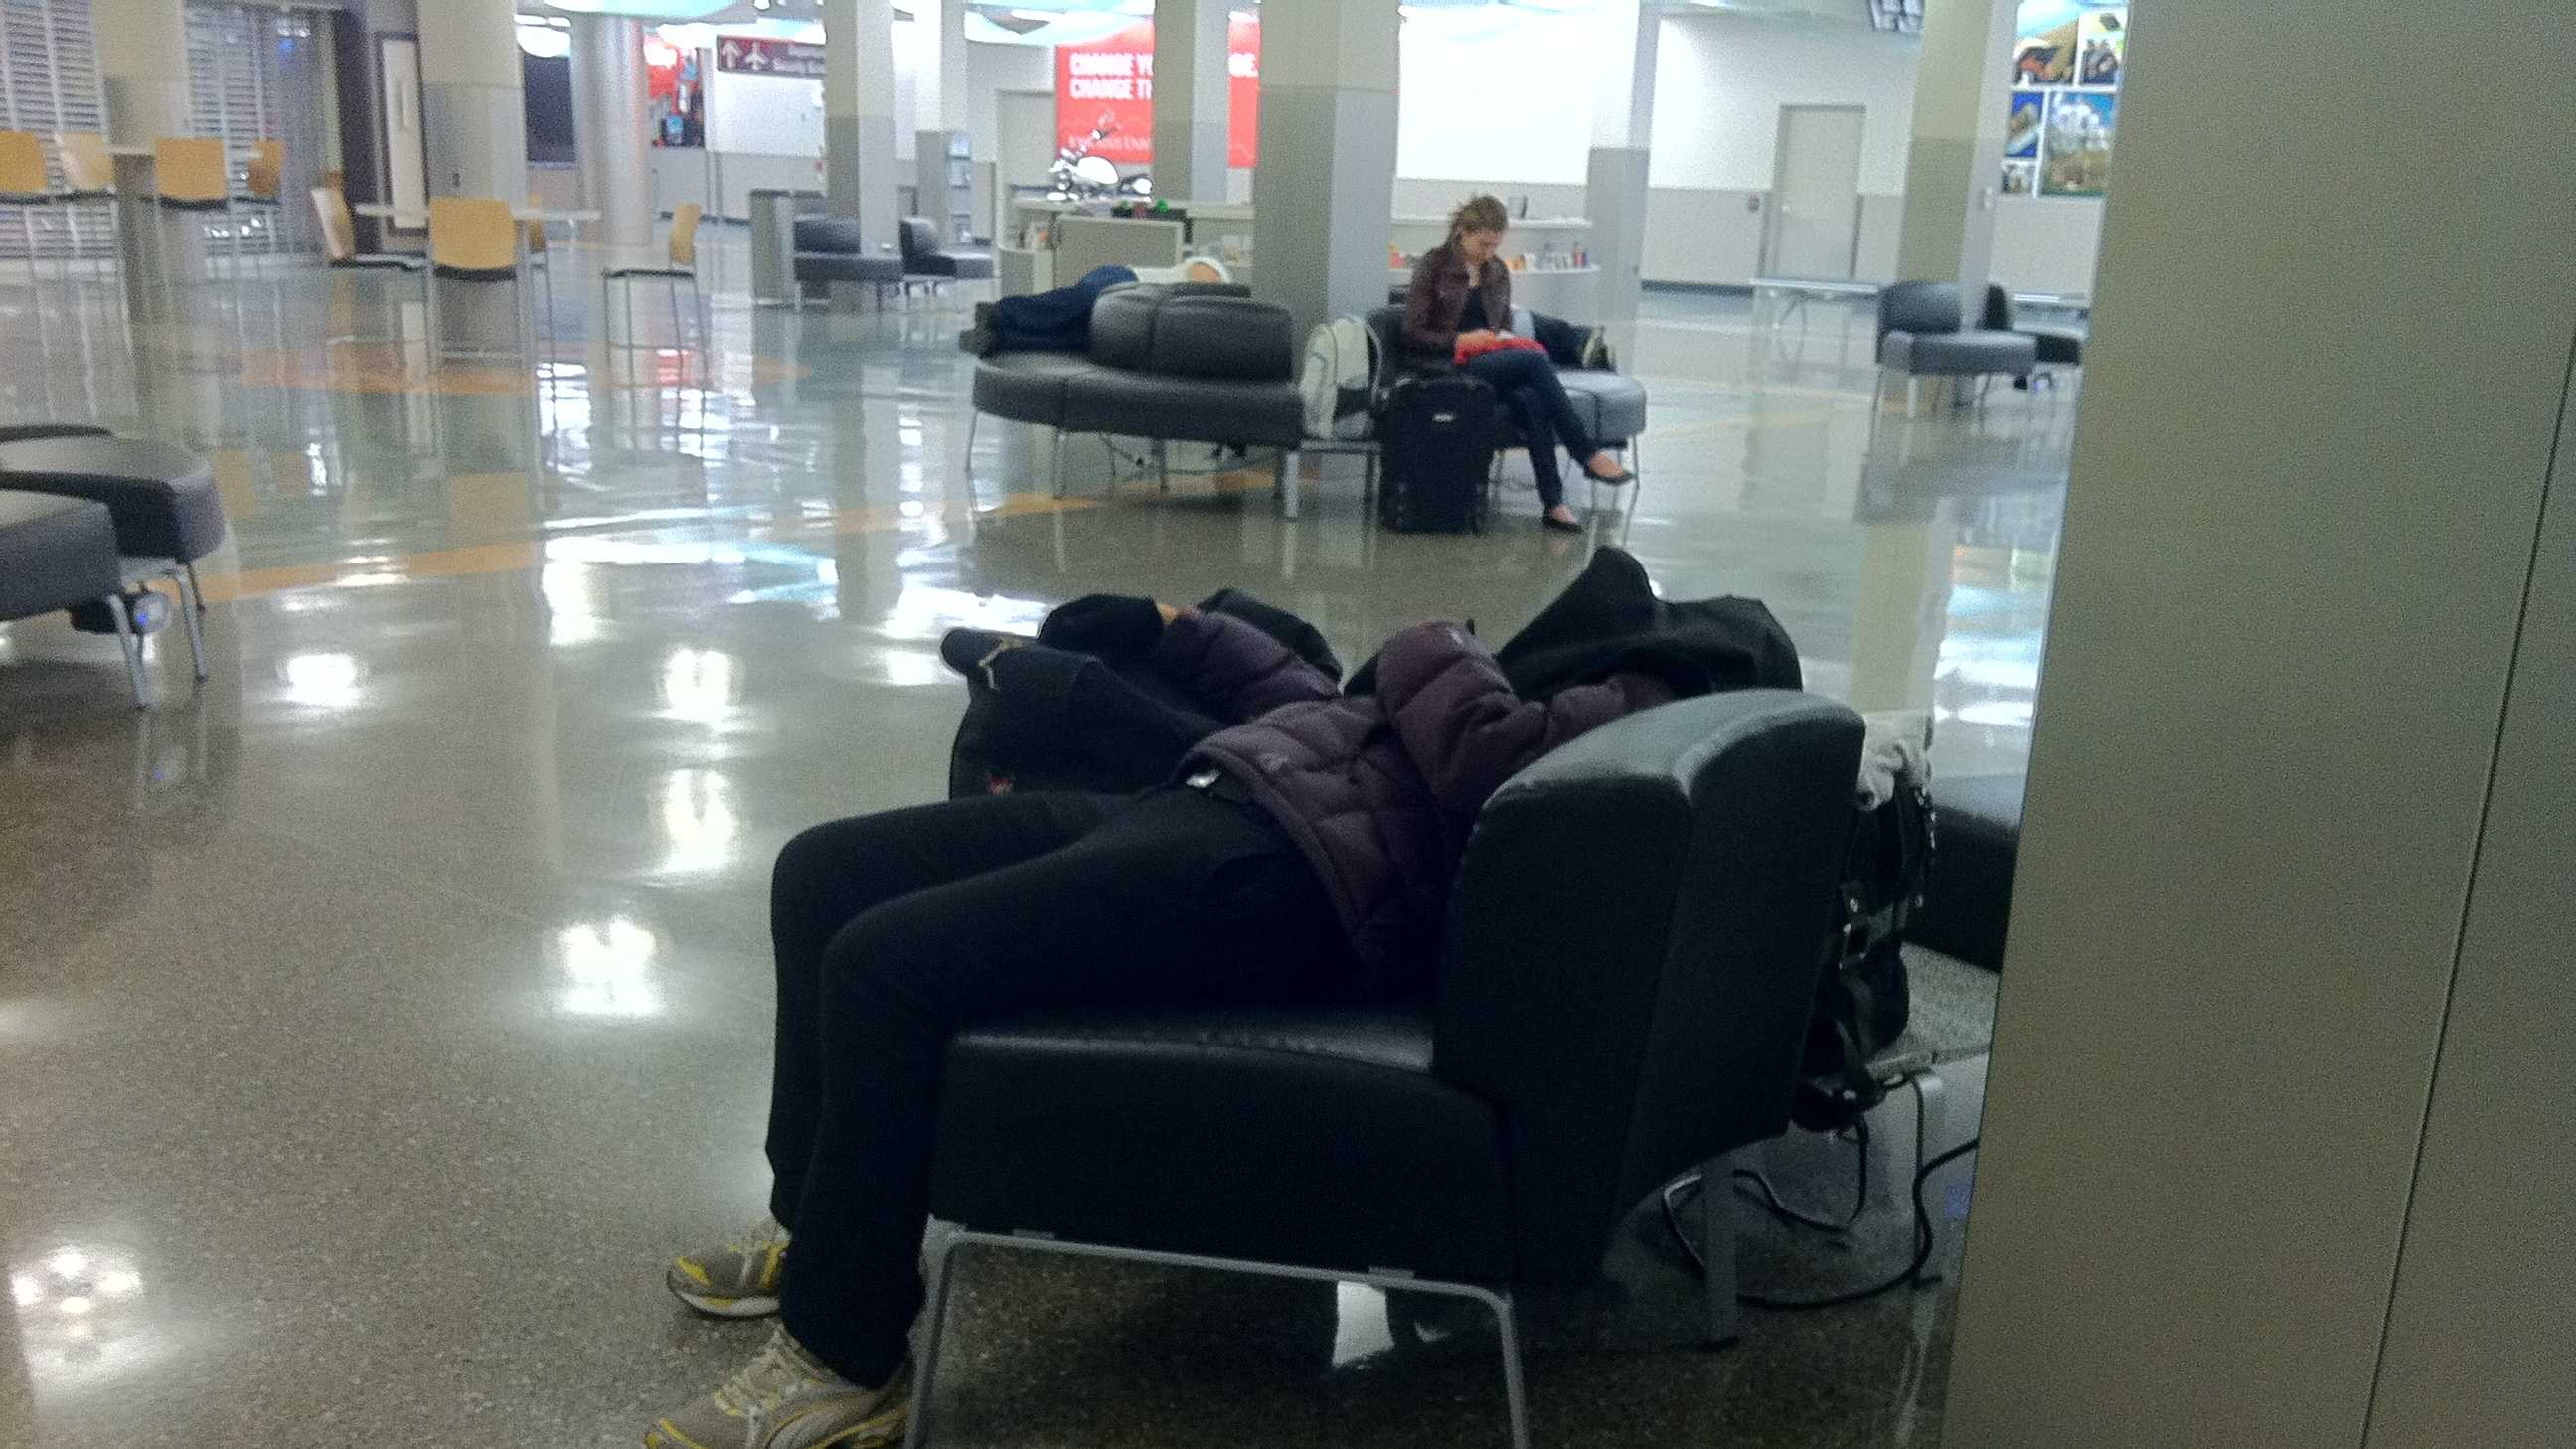 Des Moines airport stranded passengers